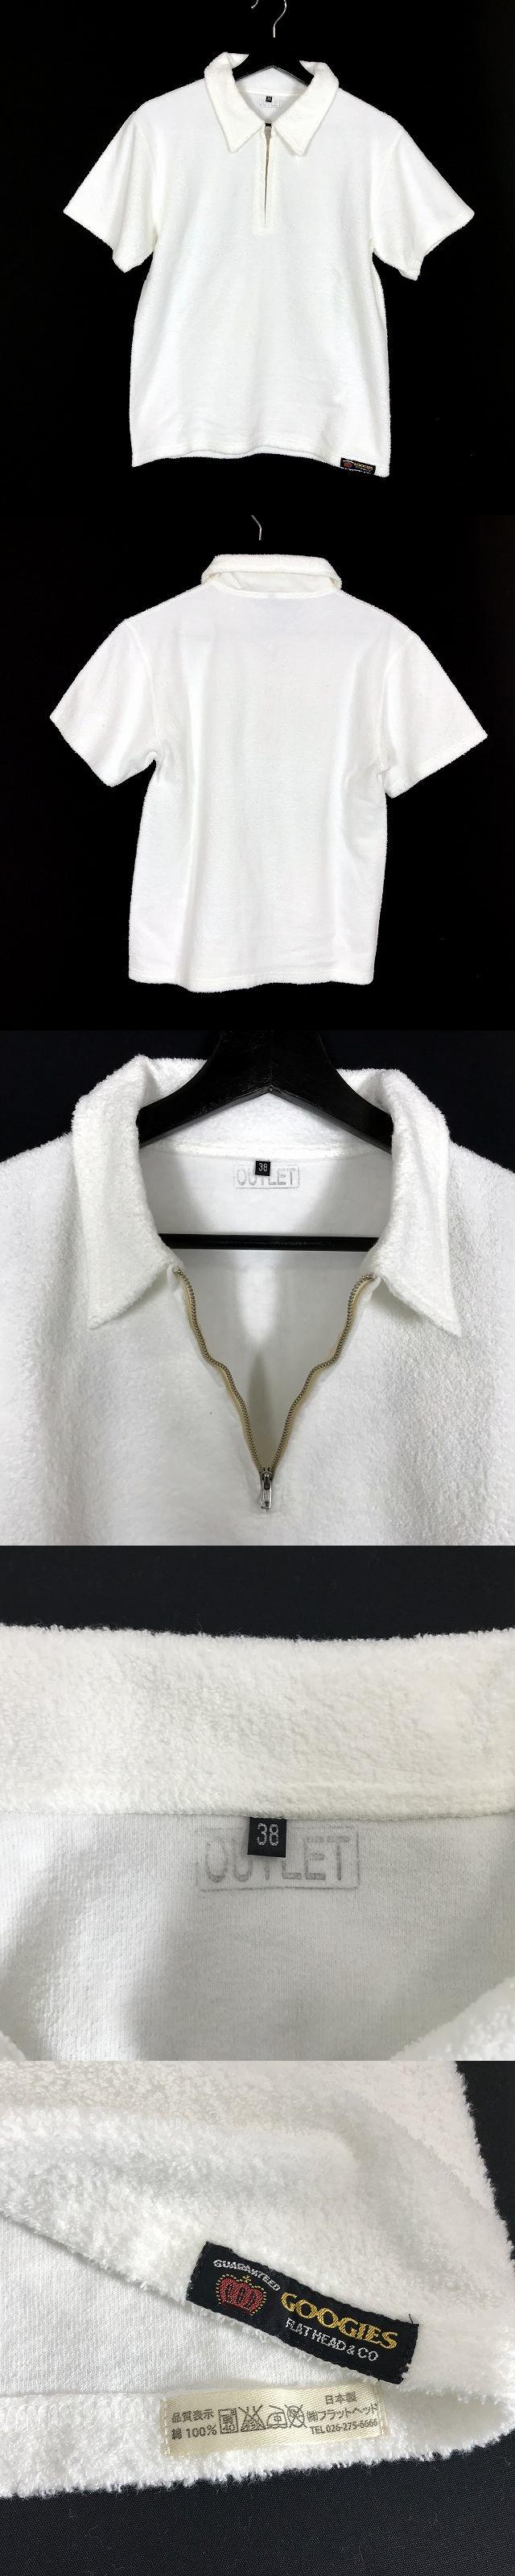 GOOGIES ハーフジップ プルオーバー パイル カットソー ポロシャツ 半袖 白 ホワイト 38